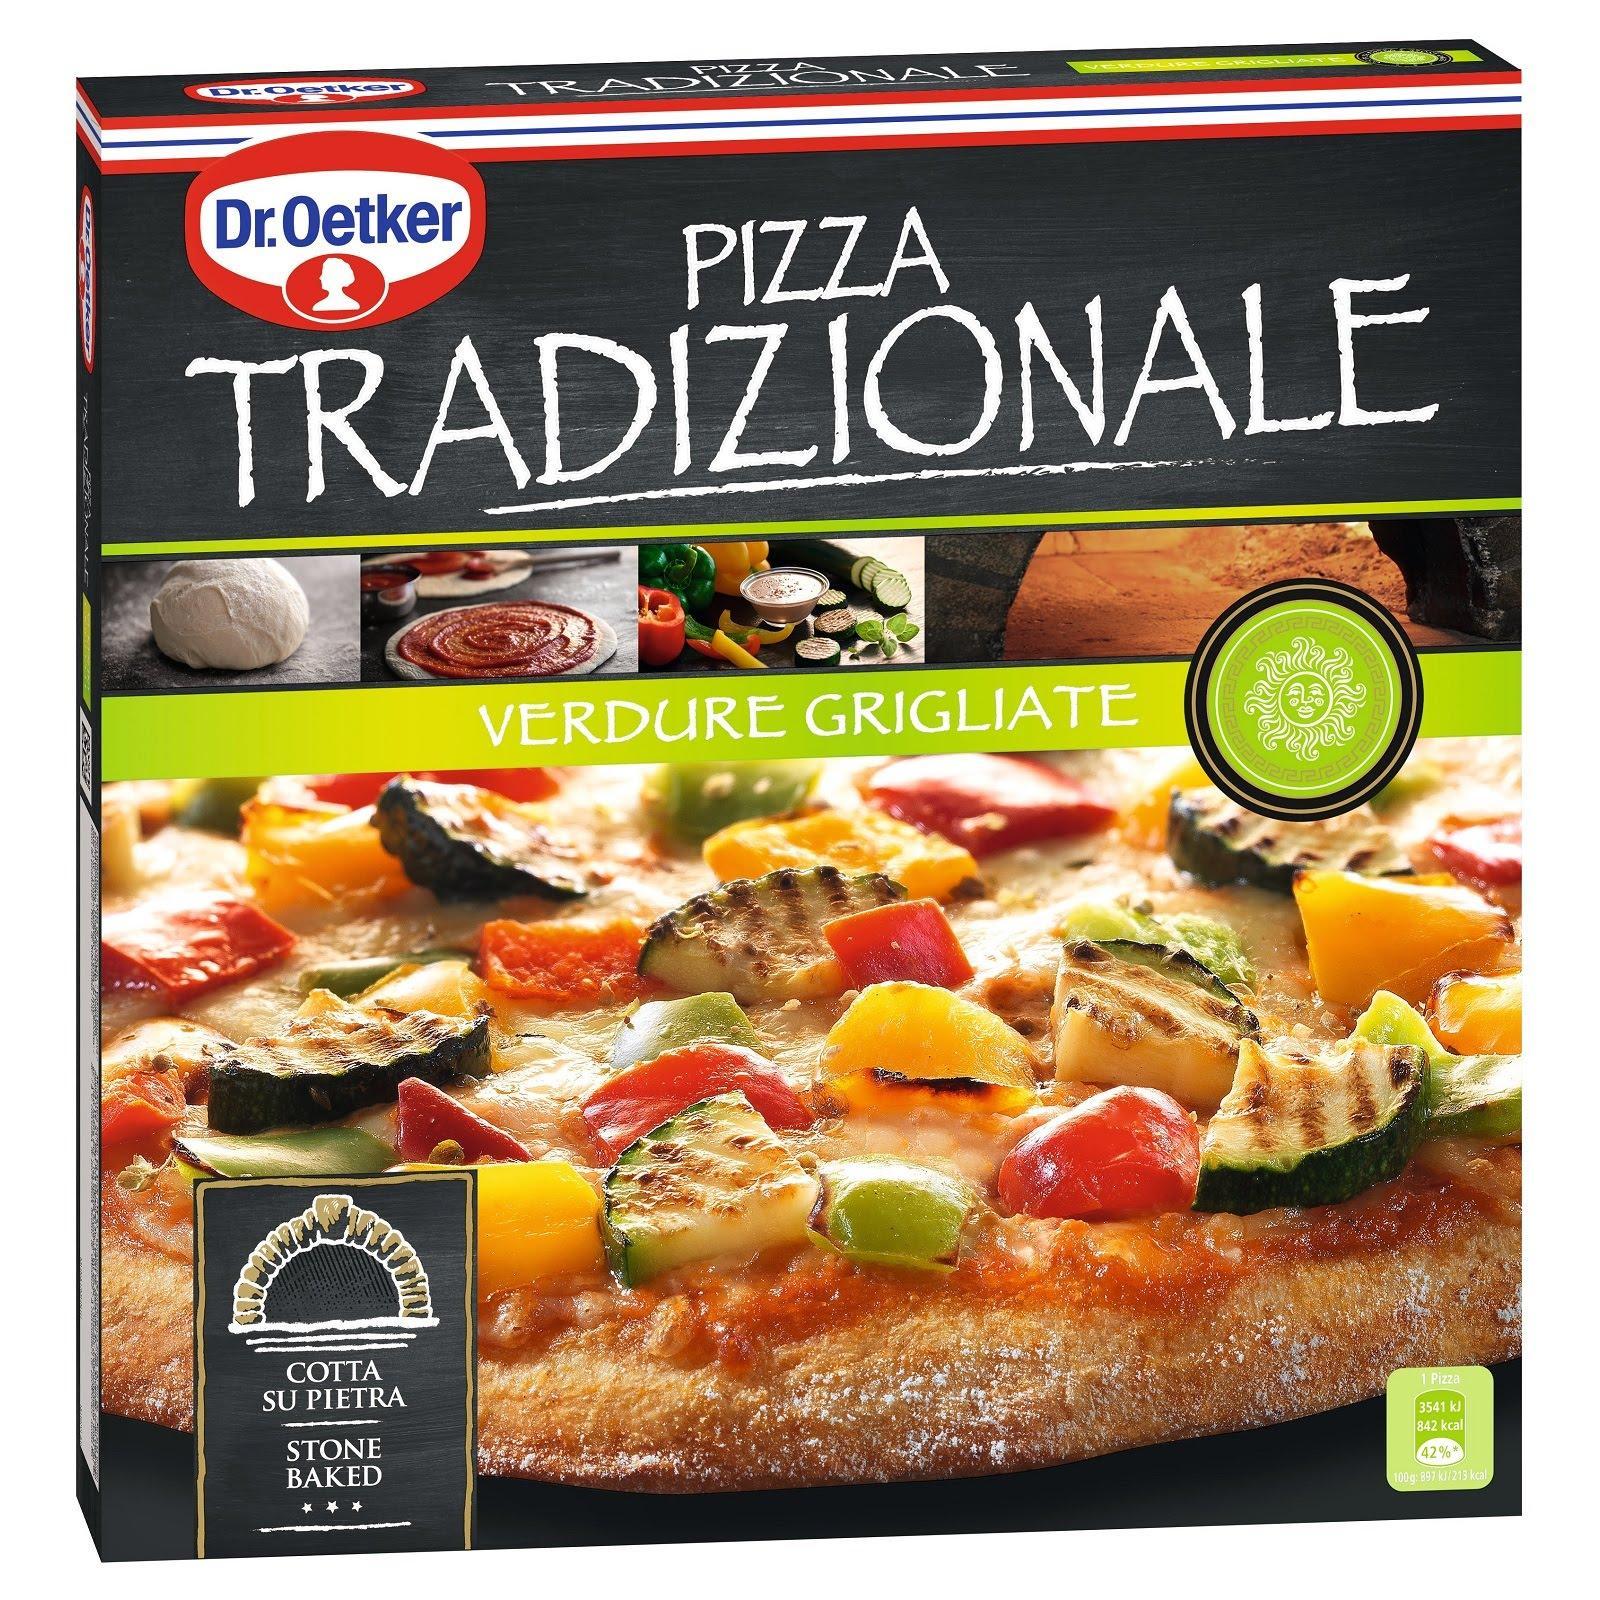 Dr Oetker Tradizionale Grilled Vegetables Pizza - Frozen